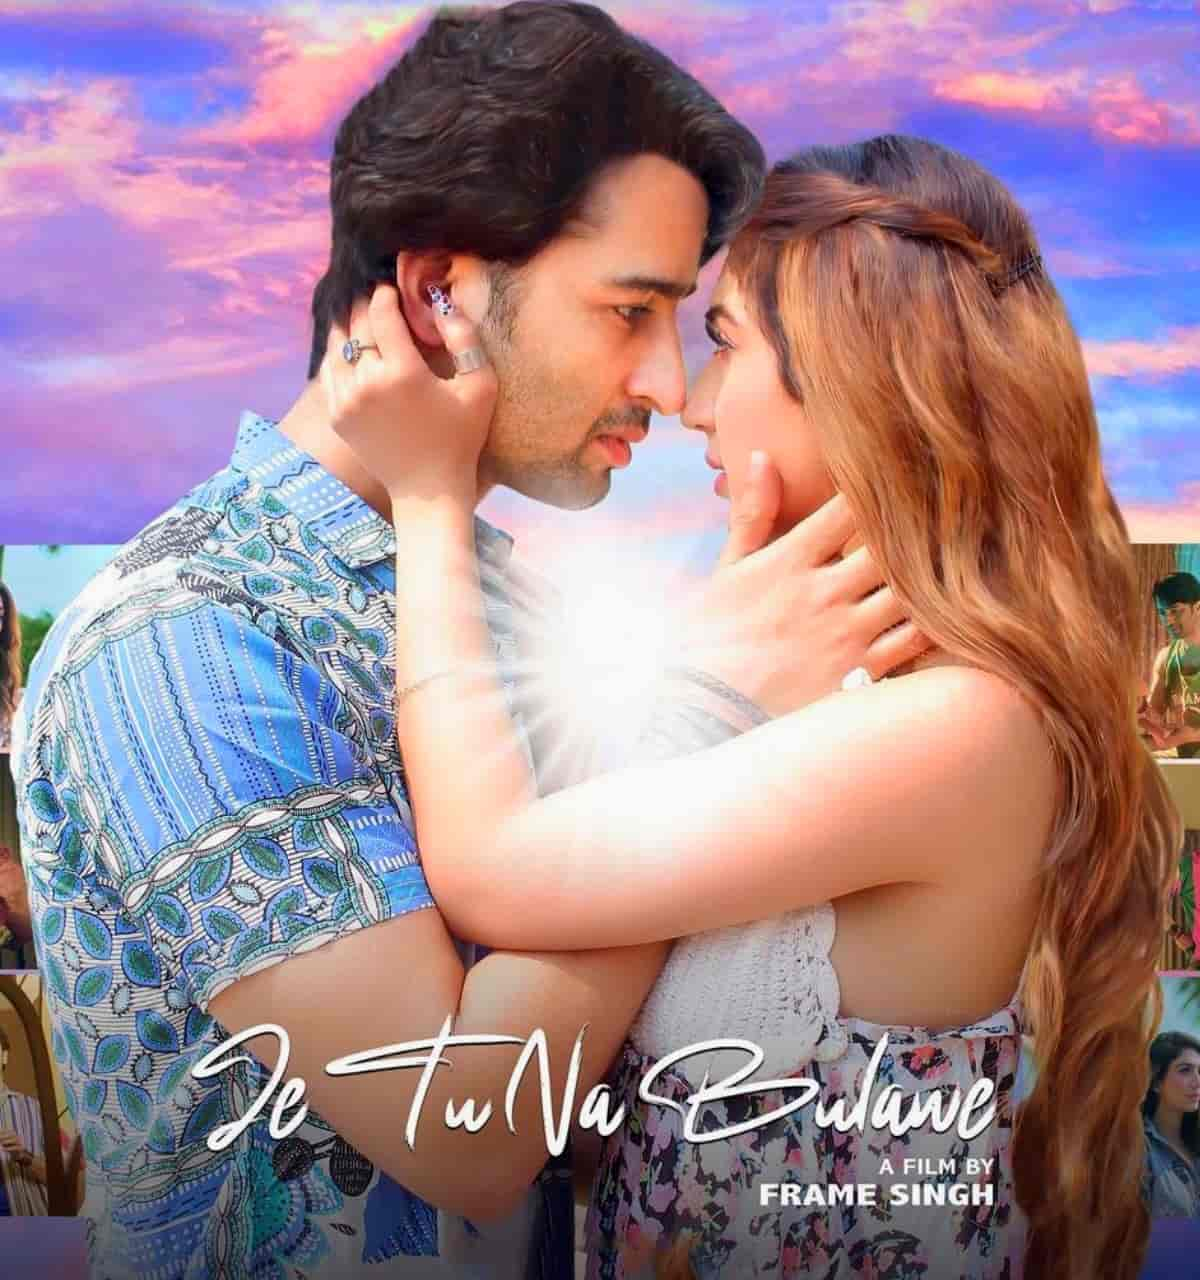 Je Tu Na Bulawe Punjabi Song Image Features Shaheer Sheikh sung by Surya